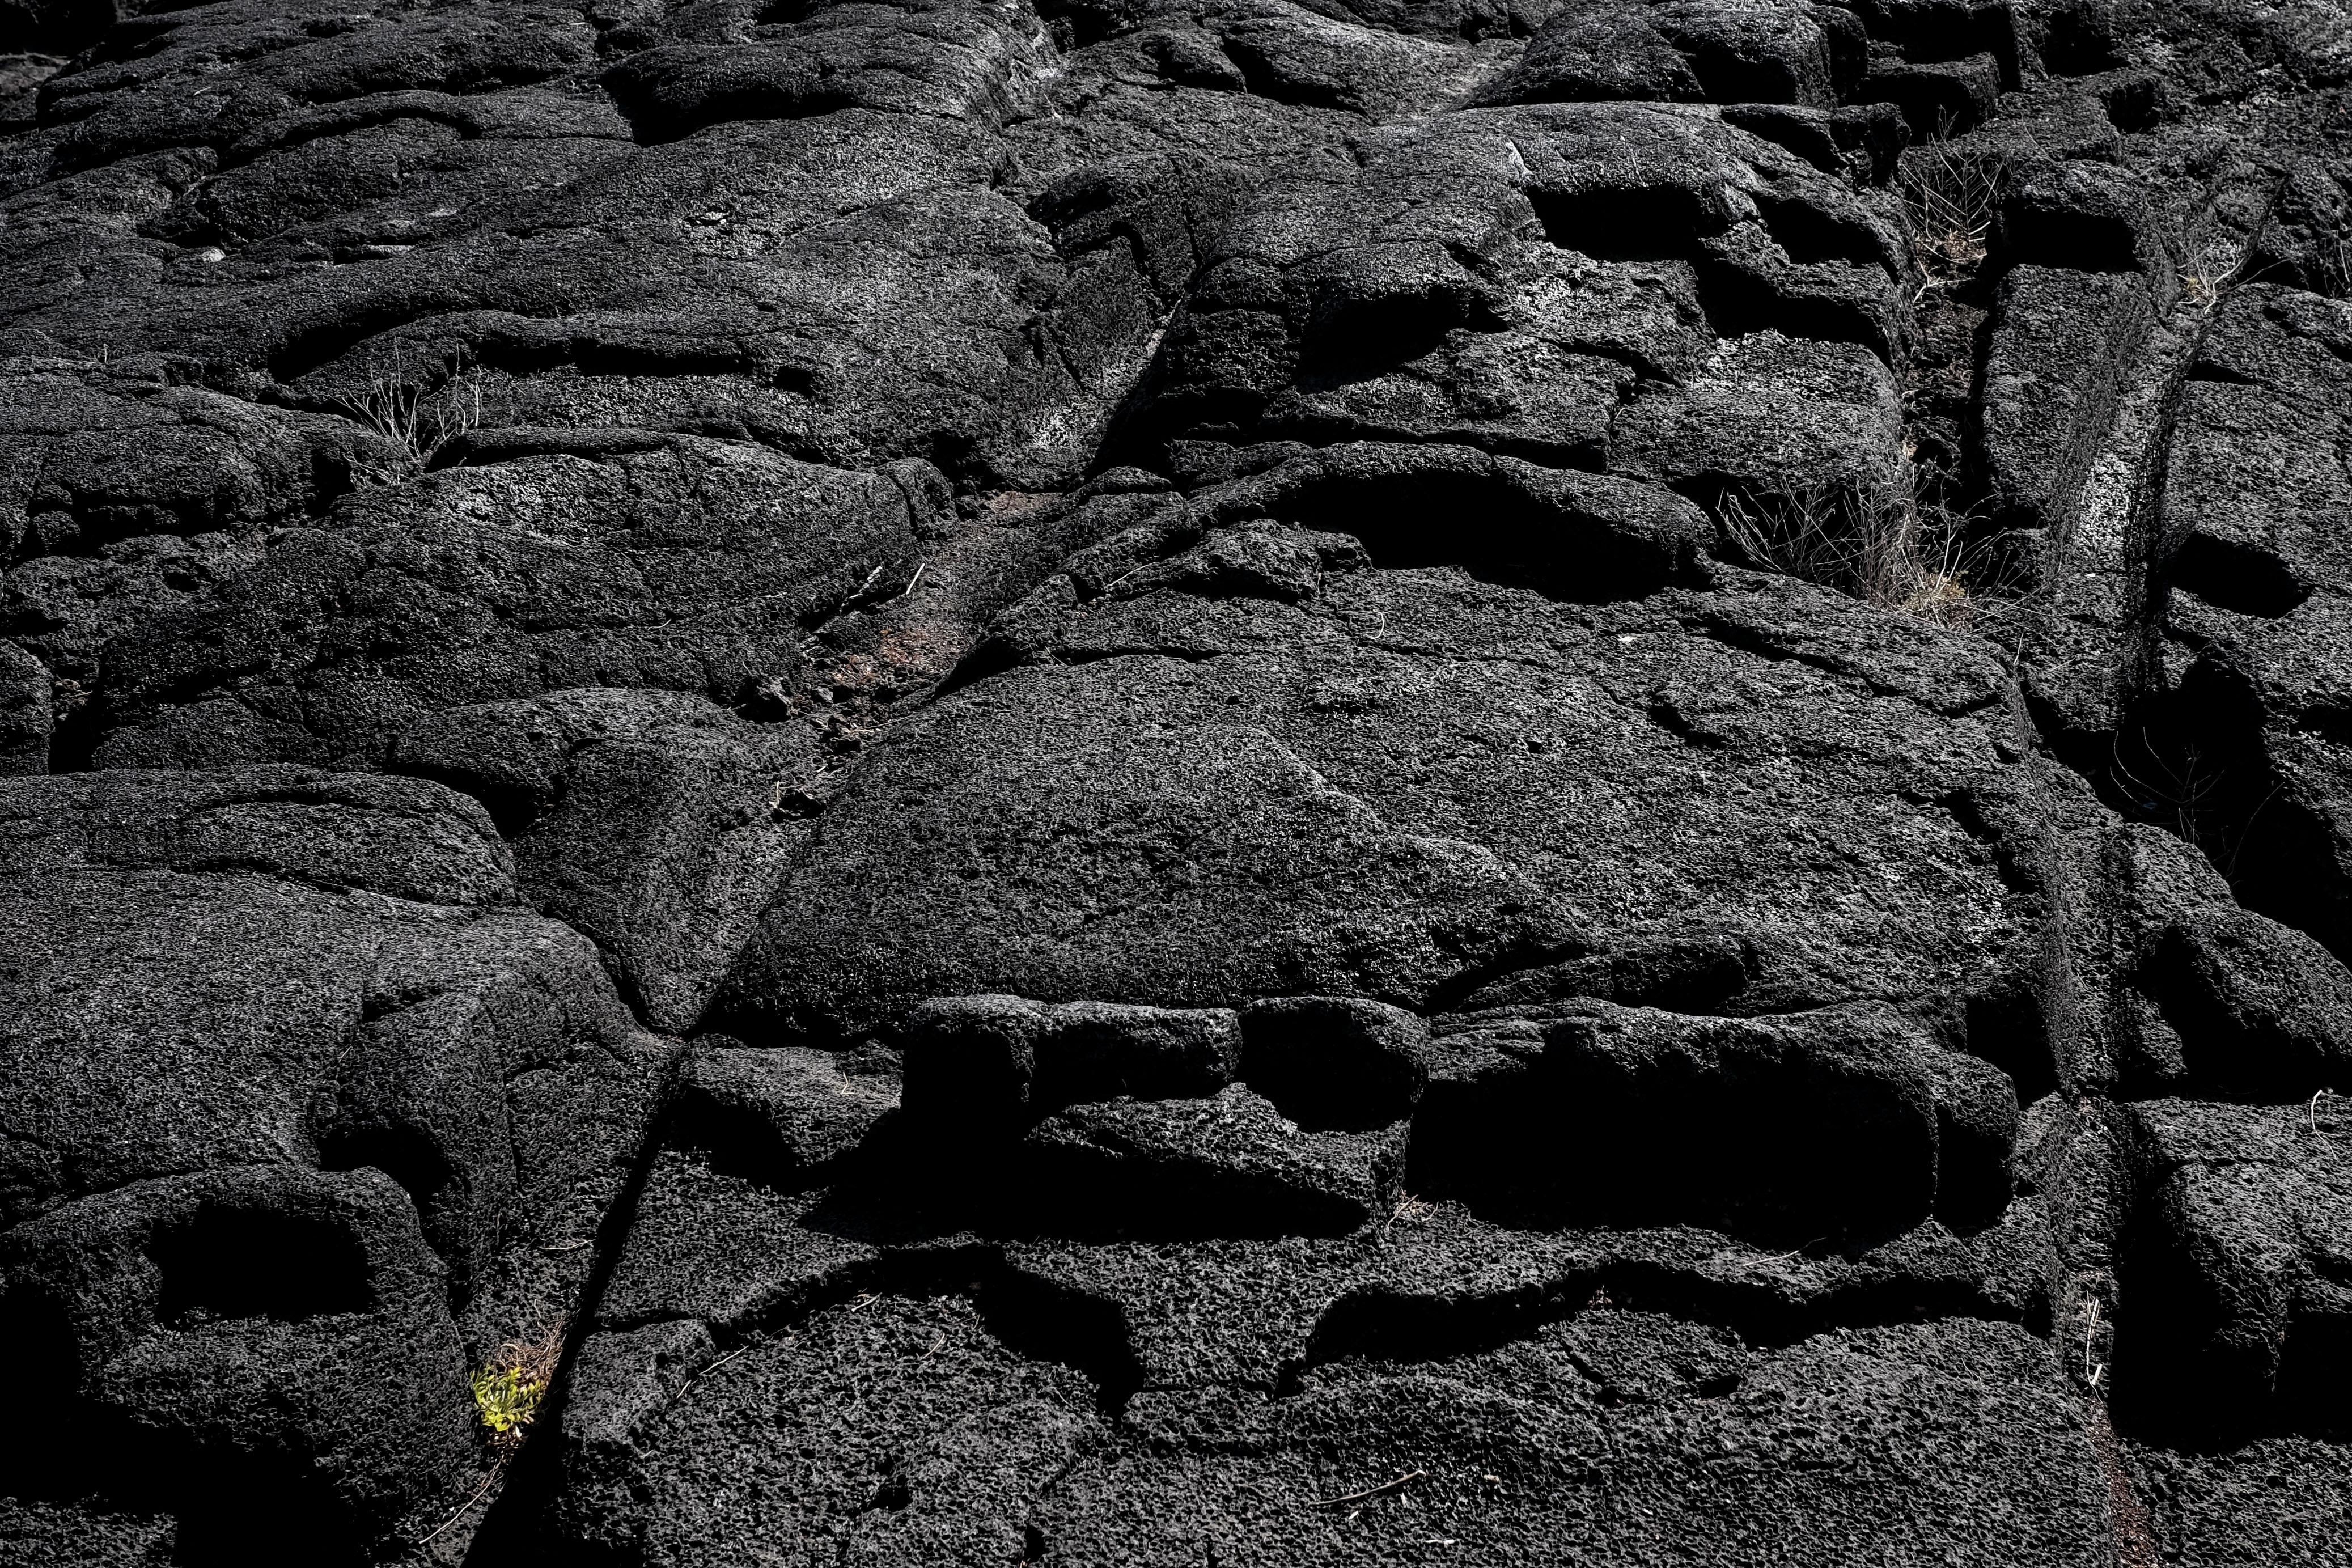 Pico. rilheiras - Foto de Manuel Roberto